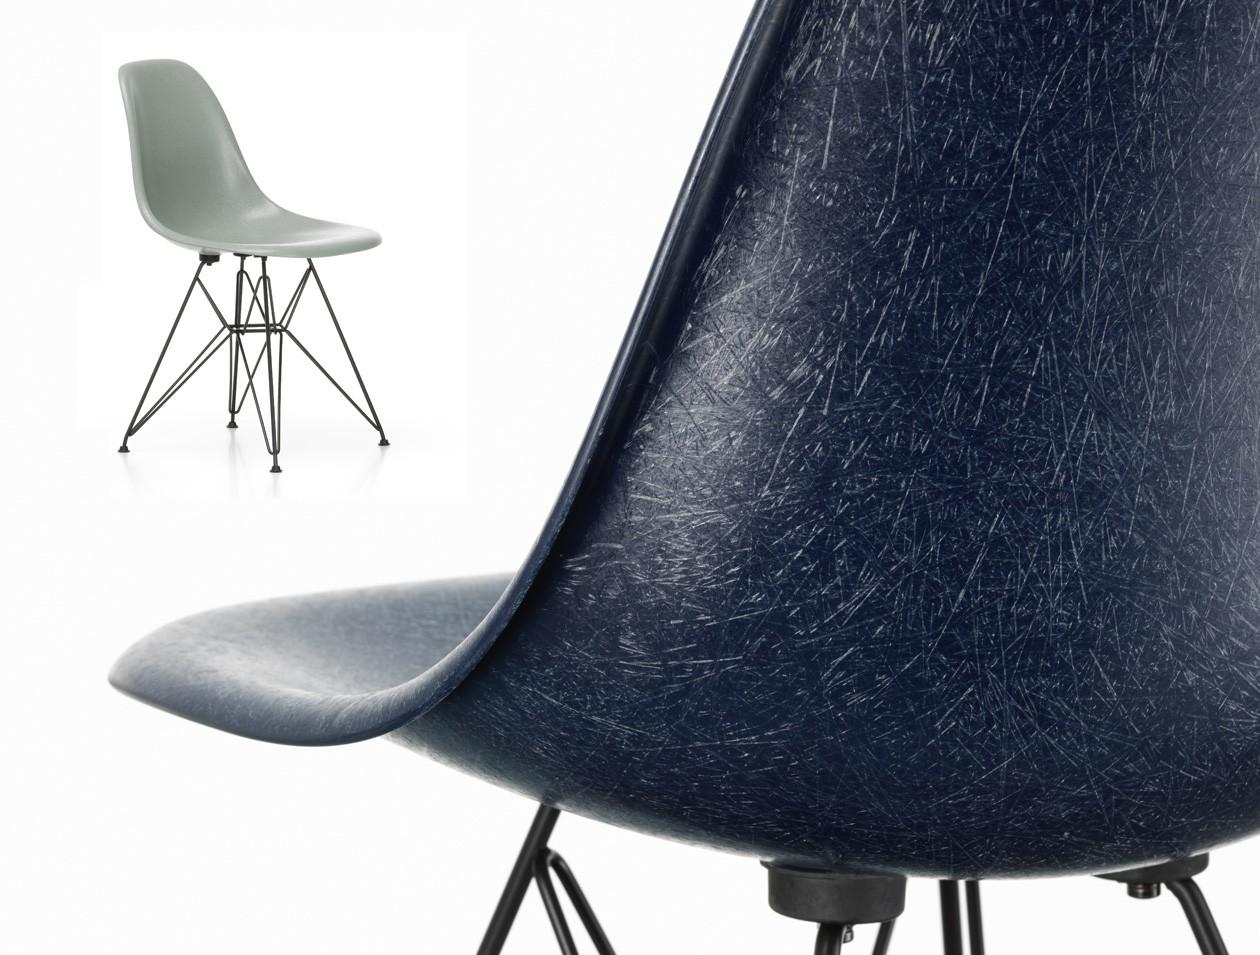 Vitra Eames Fiberglass Chair